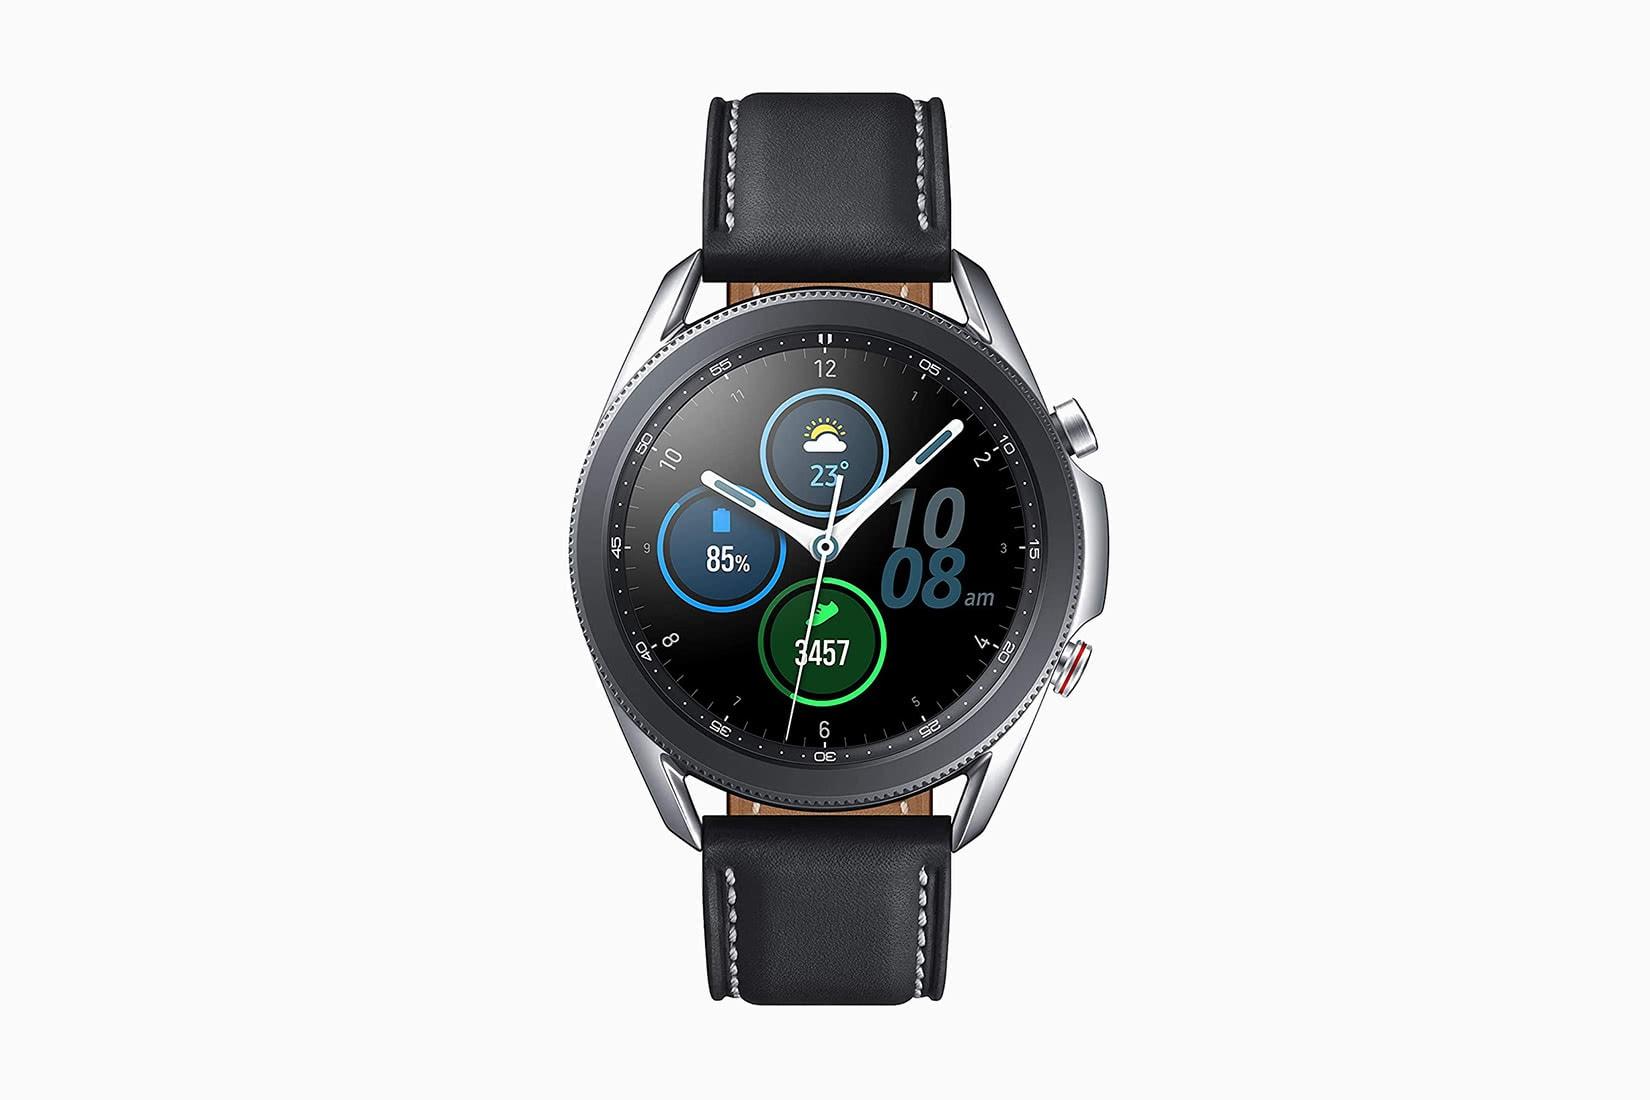 best men watches samsung galaxy watch 3 review - Luxe Digital